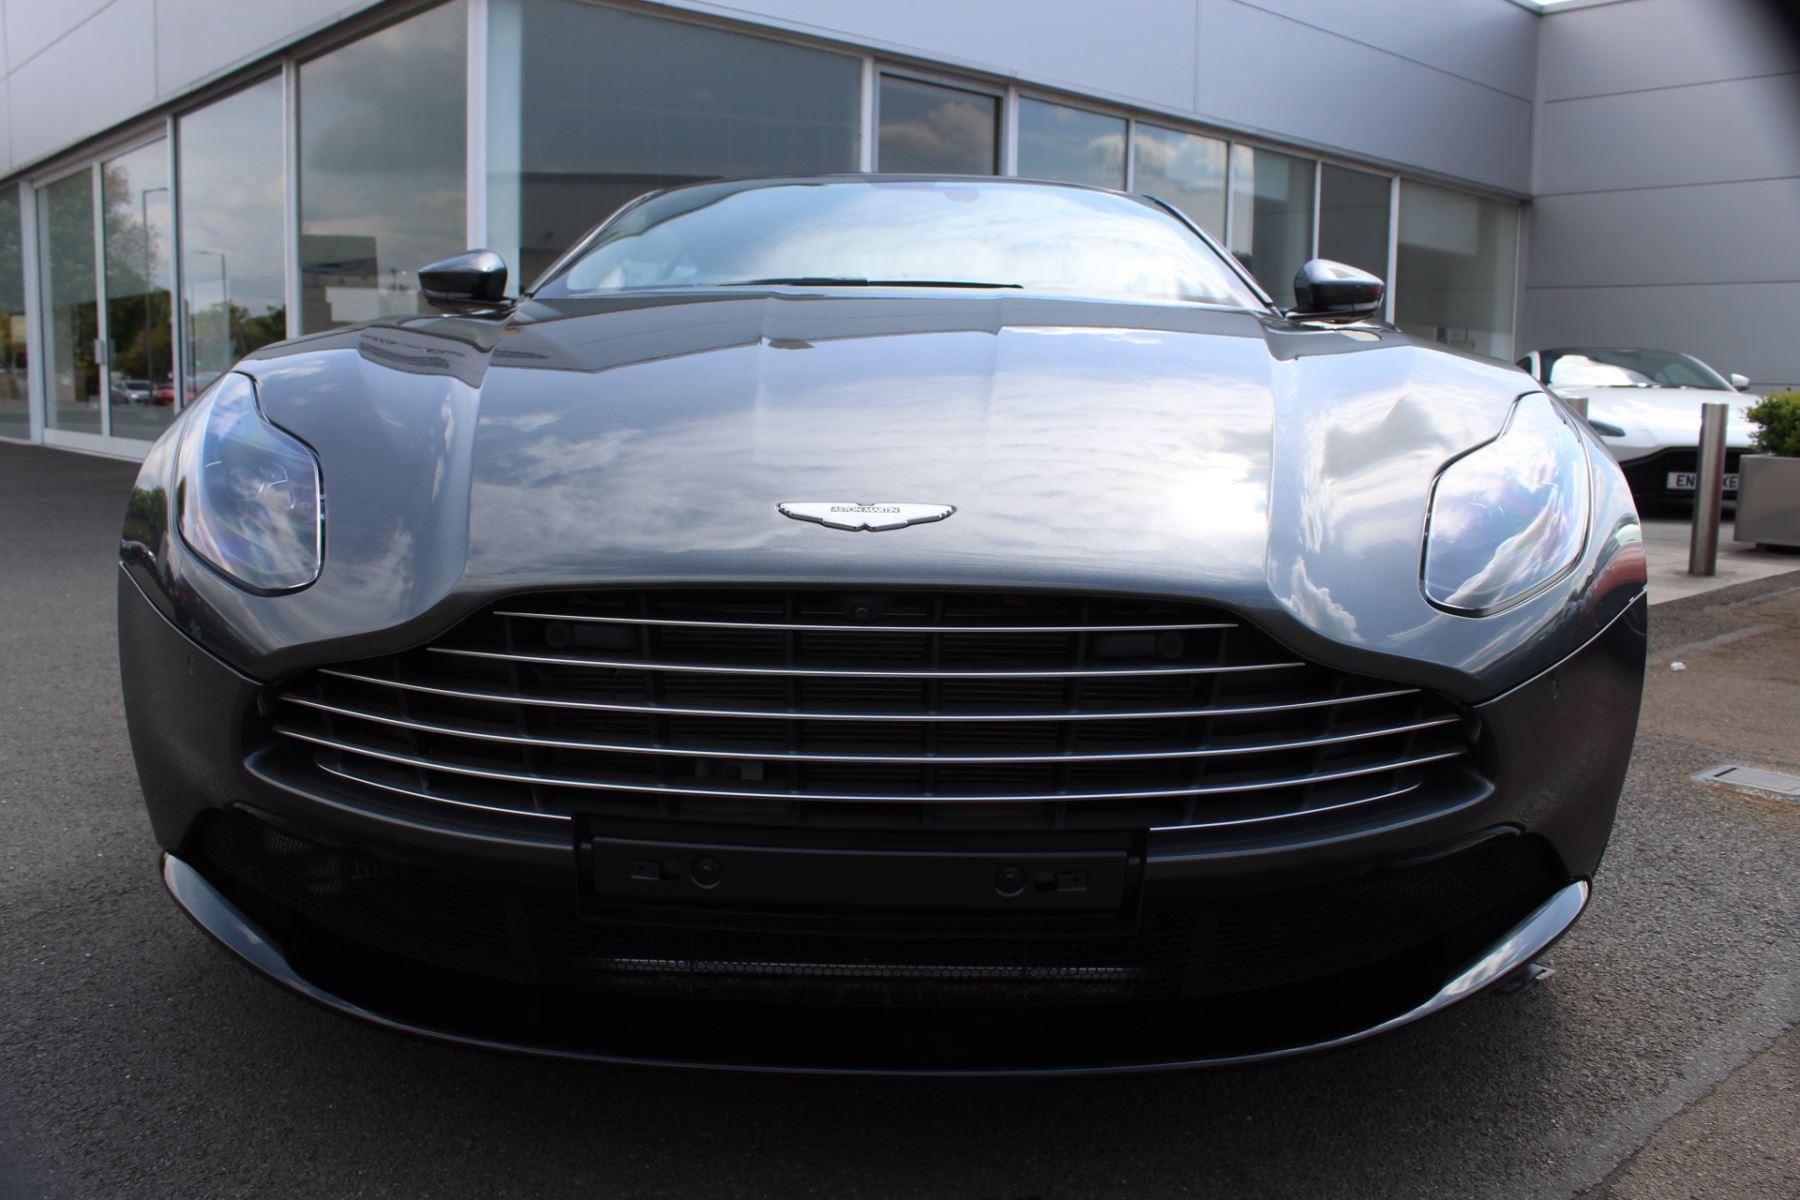 Aston Martin DB11 V8 Touchtronic image 2